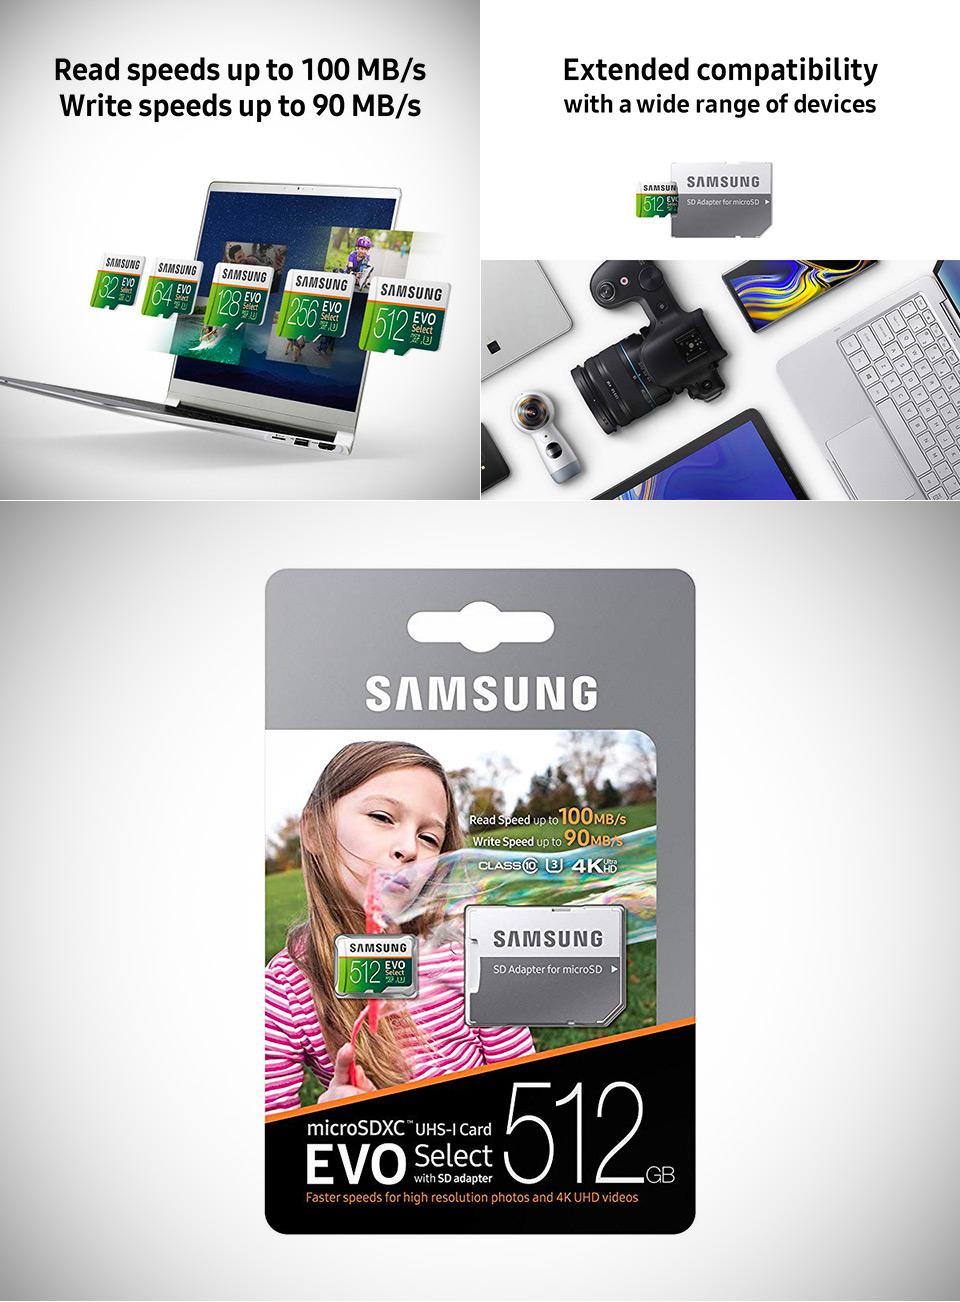 Samsung 512GB EVO Select microSD